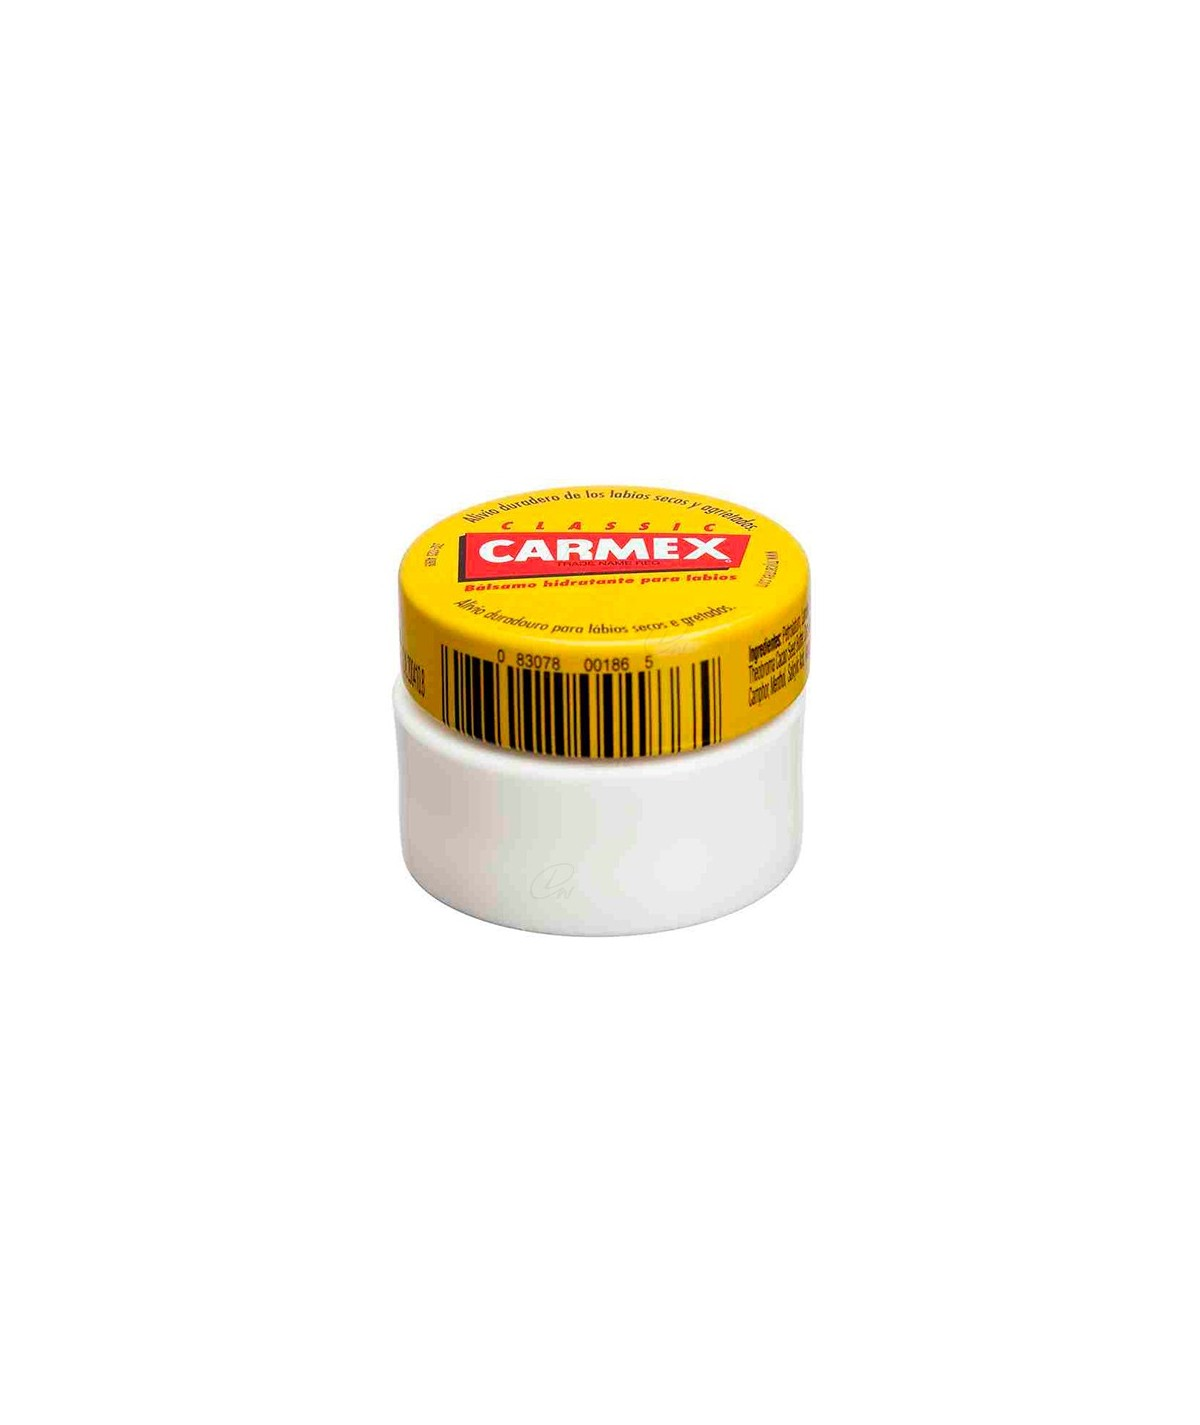 CARMEX CLASSIC BALSAMO LABIAL TARRITO 7, 5 G